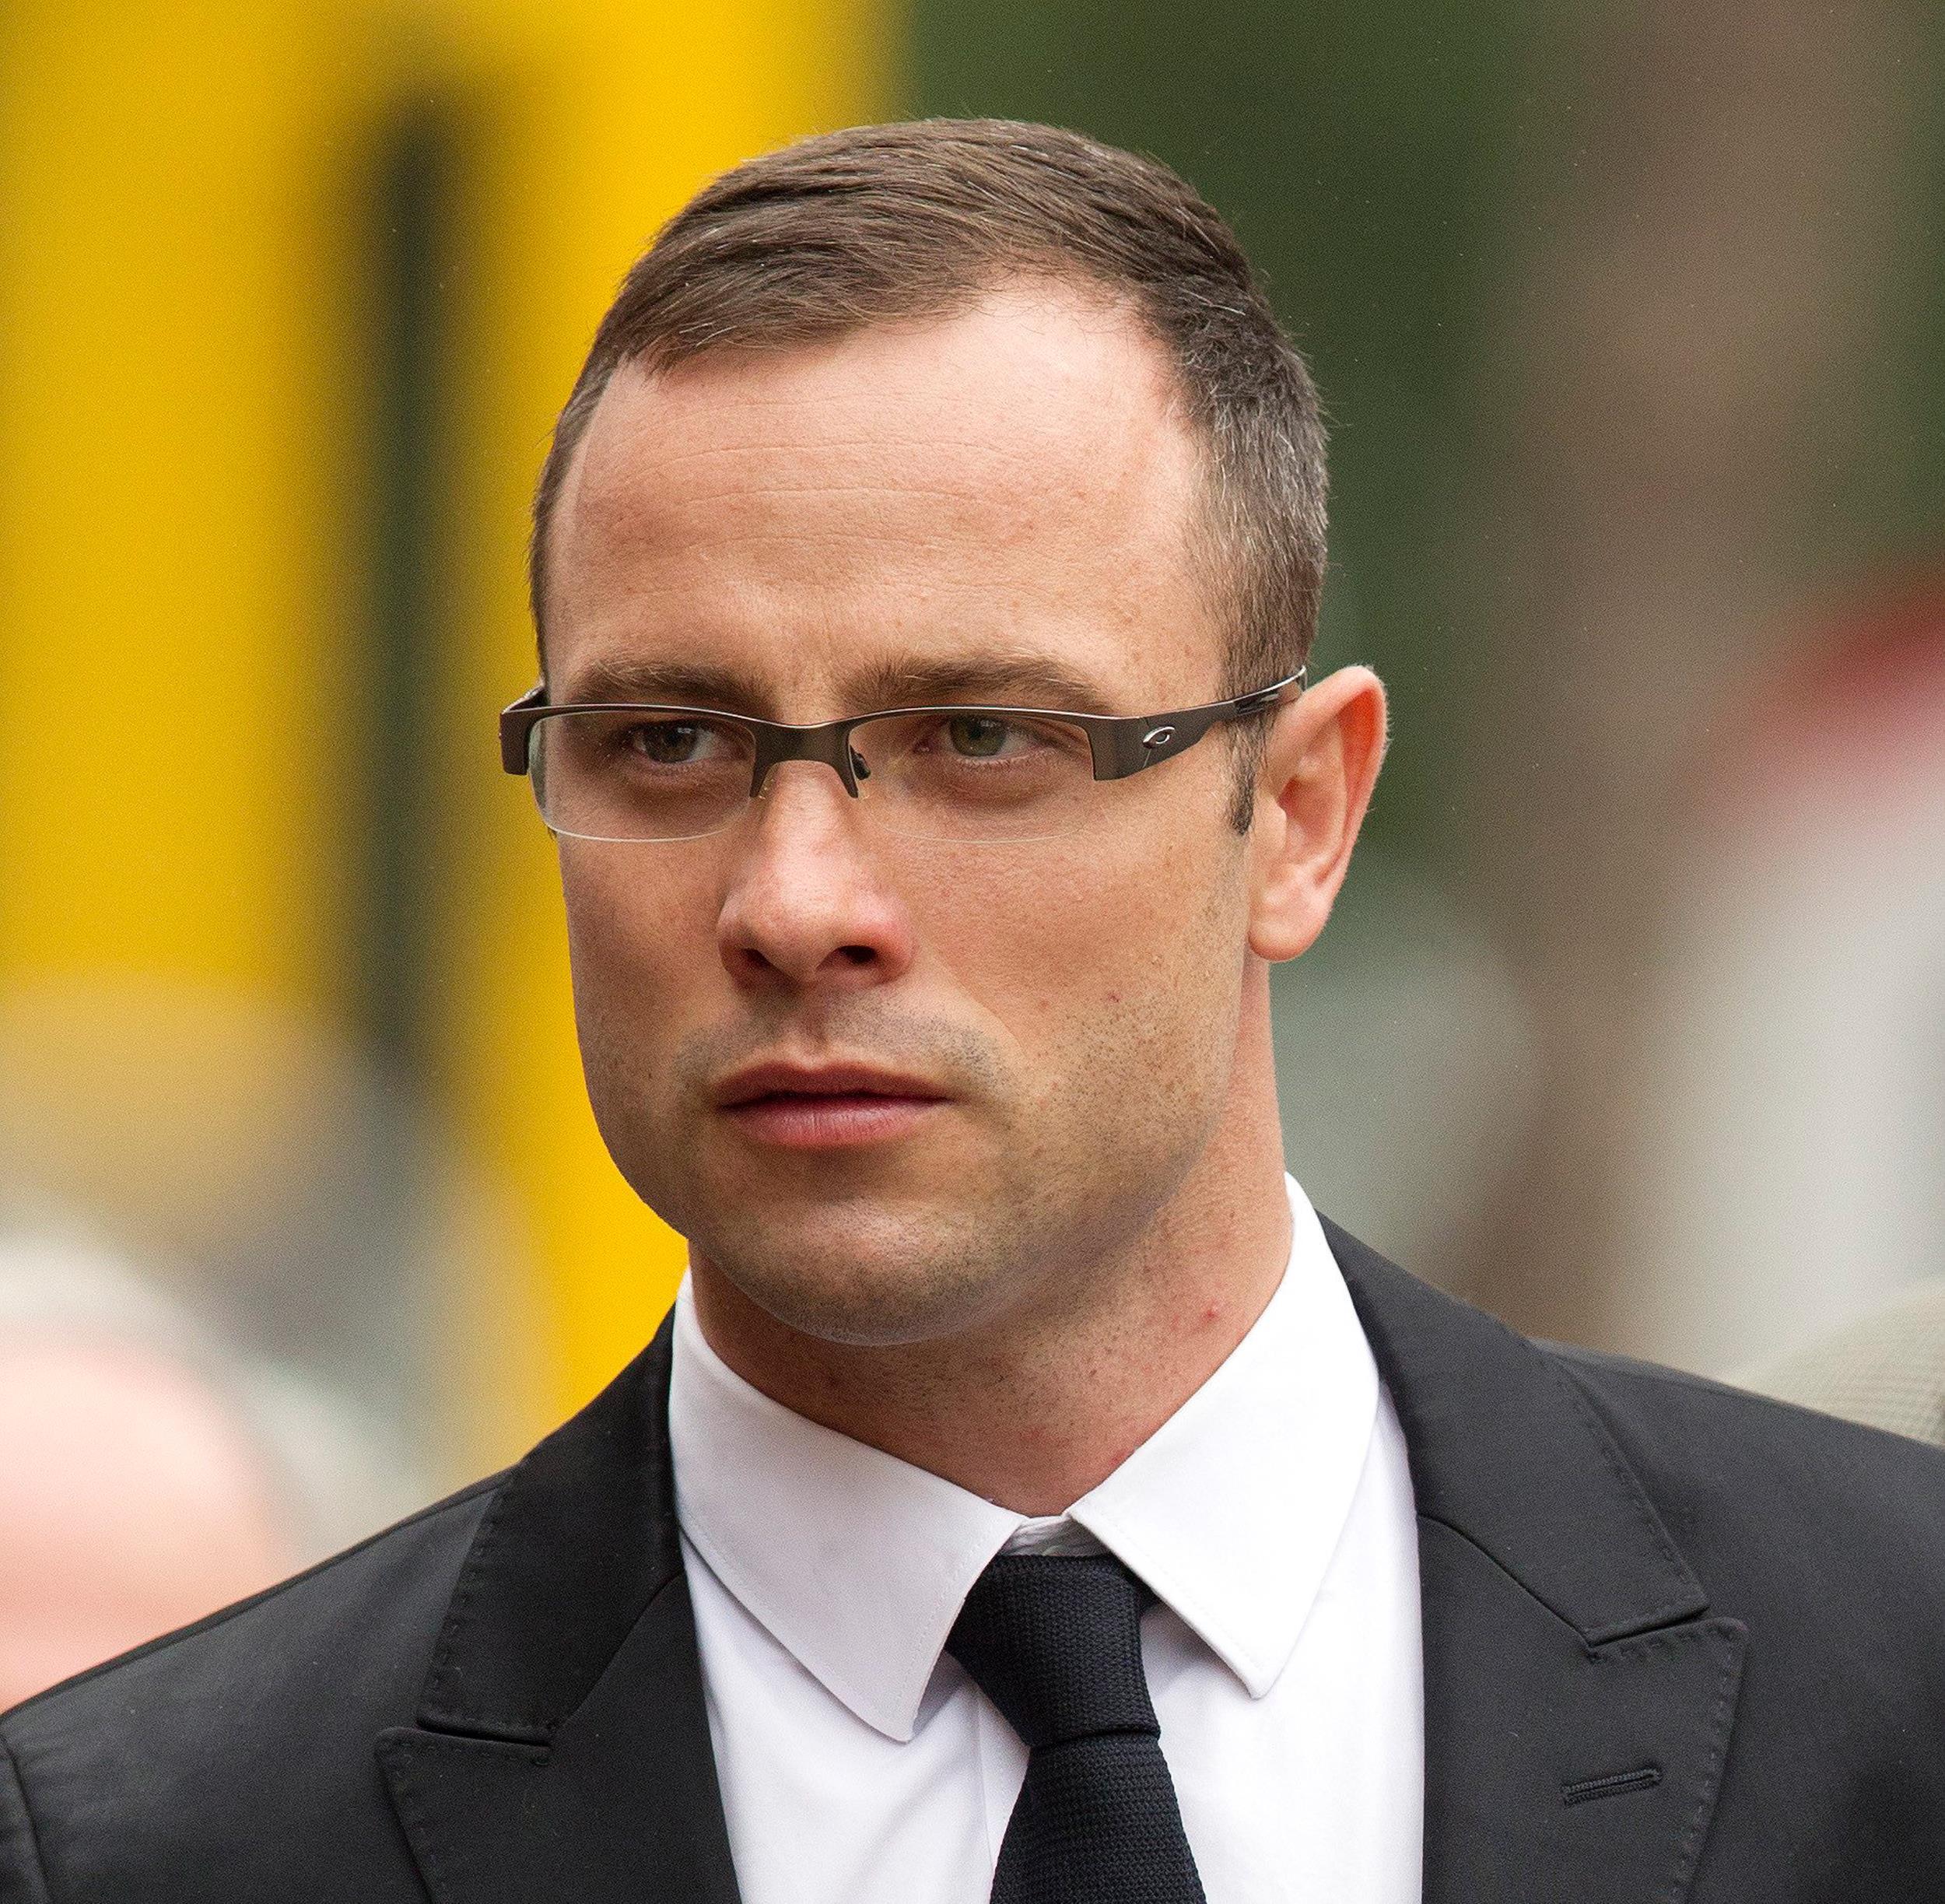 Prosecution Rests in Oscar Pistorius Murder Trial - NBC News